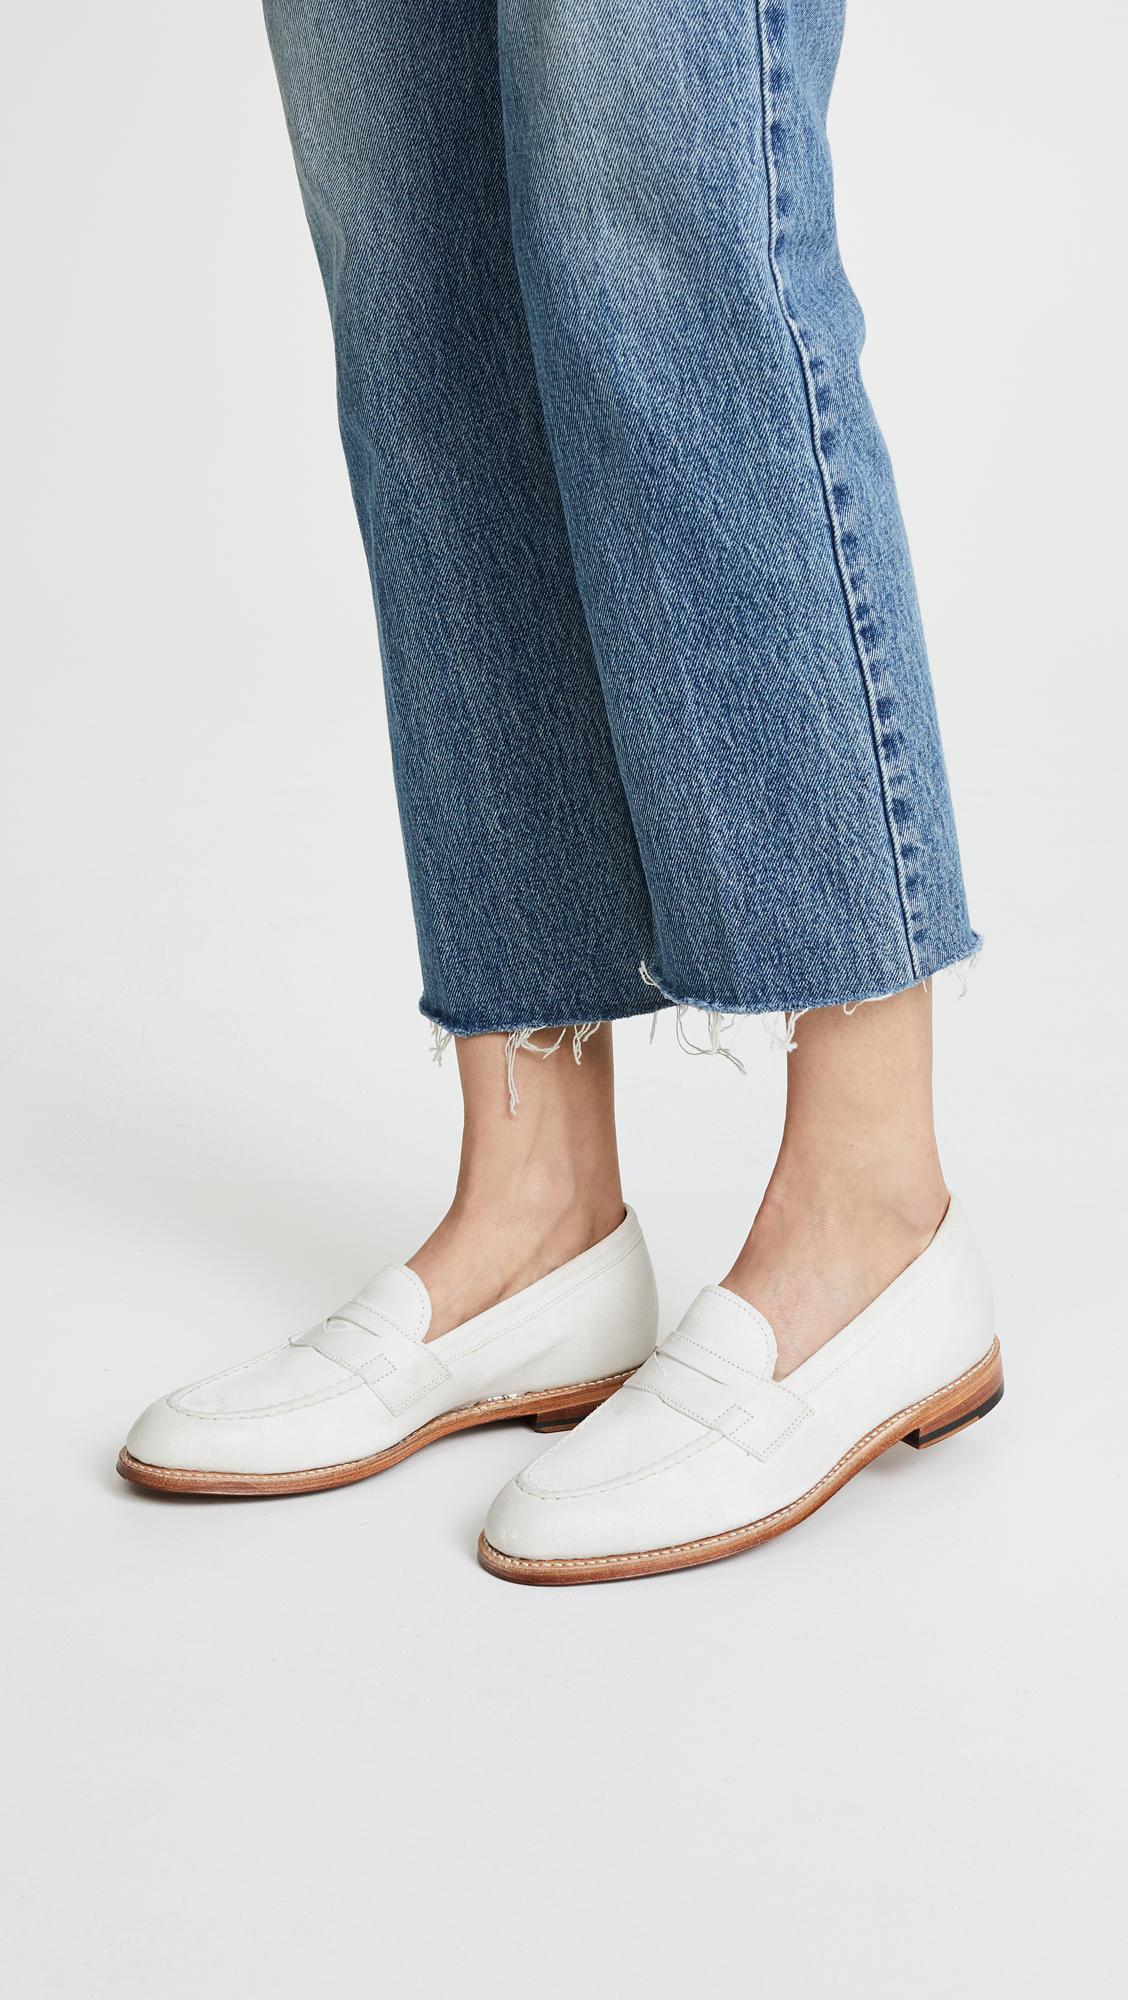 1341eb8b74c Grenson Fleur Loafers in White - Lyst